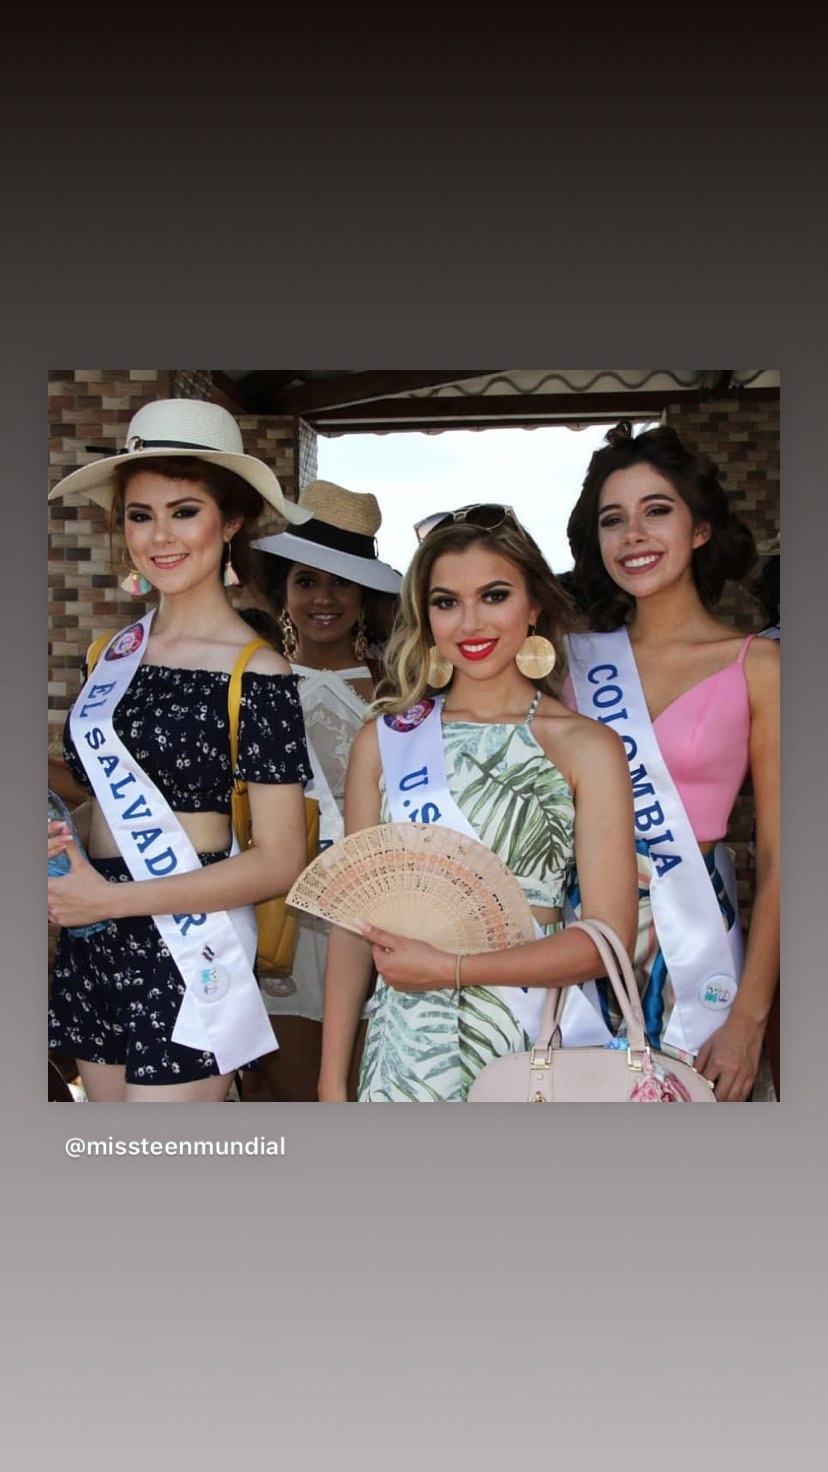 estefany frost, miss teen mundial latina usa 2019. - Página 4 60270110